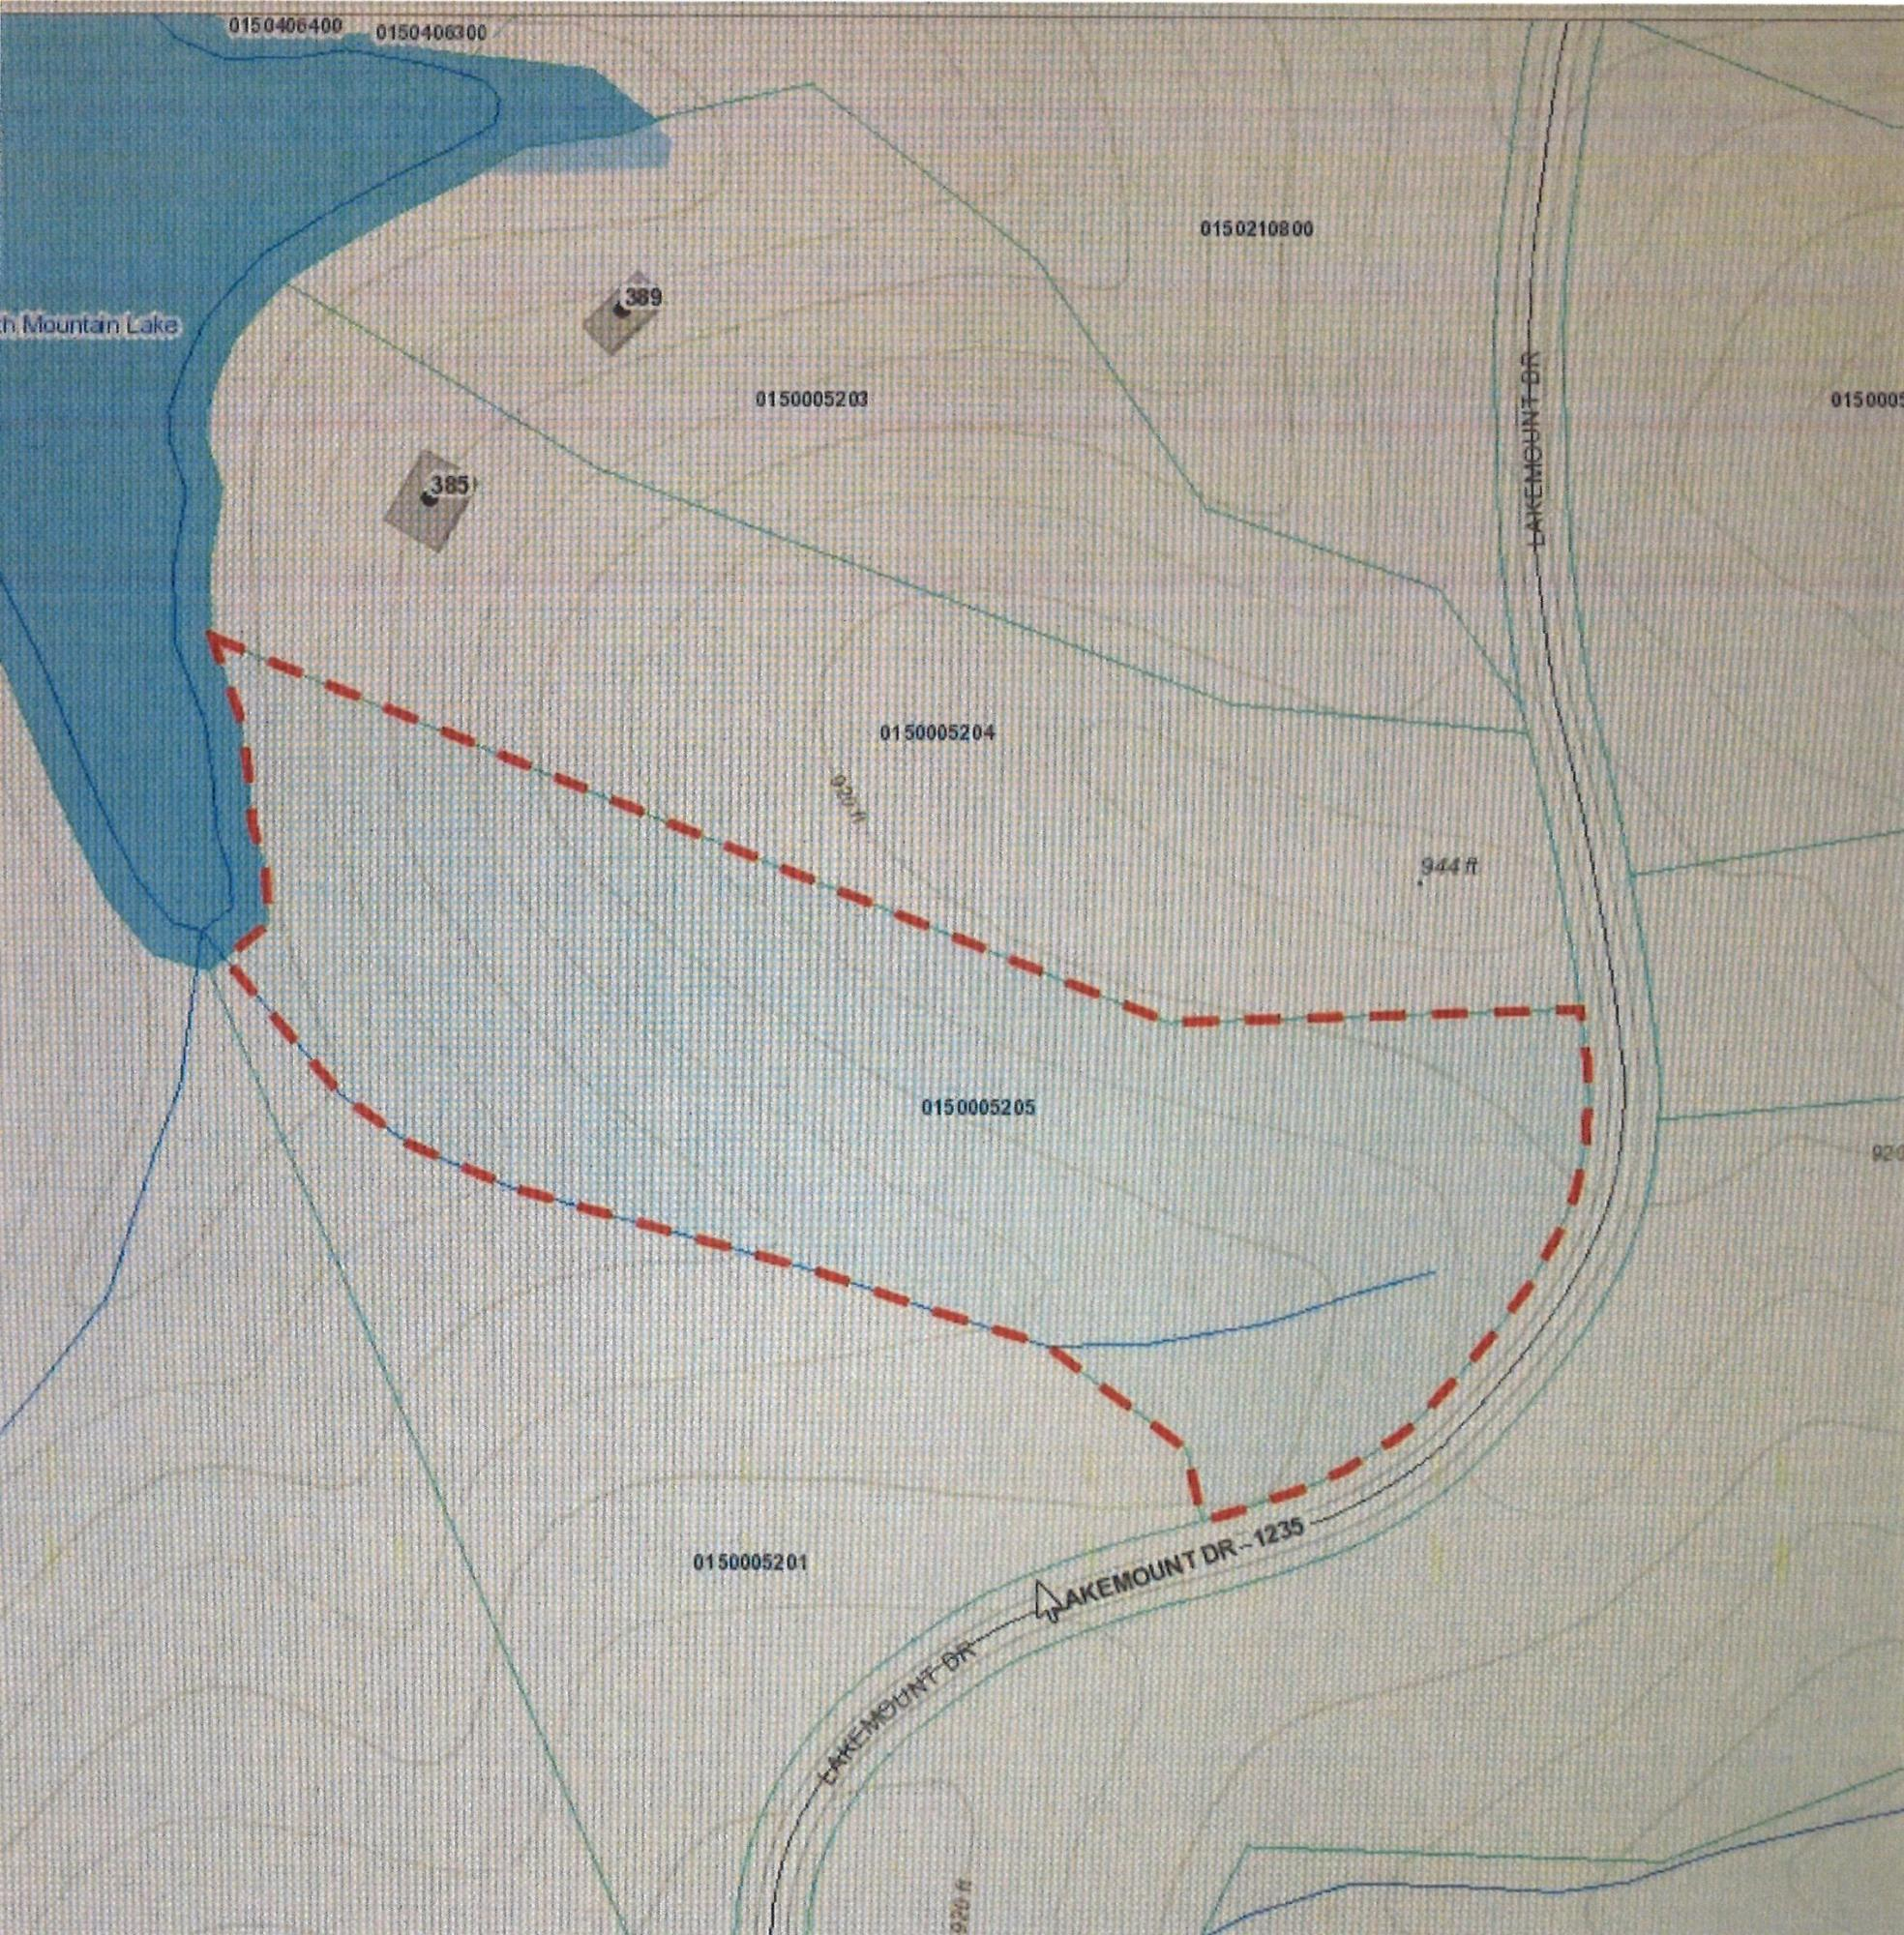 Photo of Tract 3 Lakemount DR Moneta VA 24121